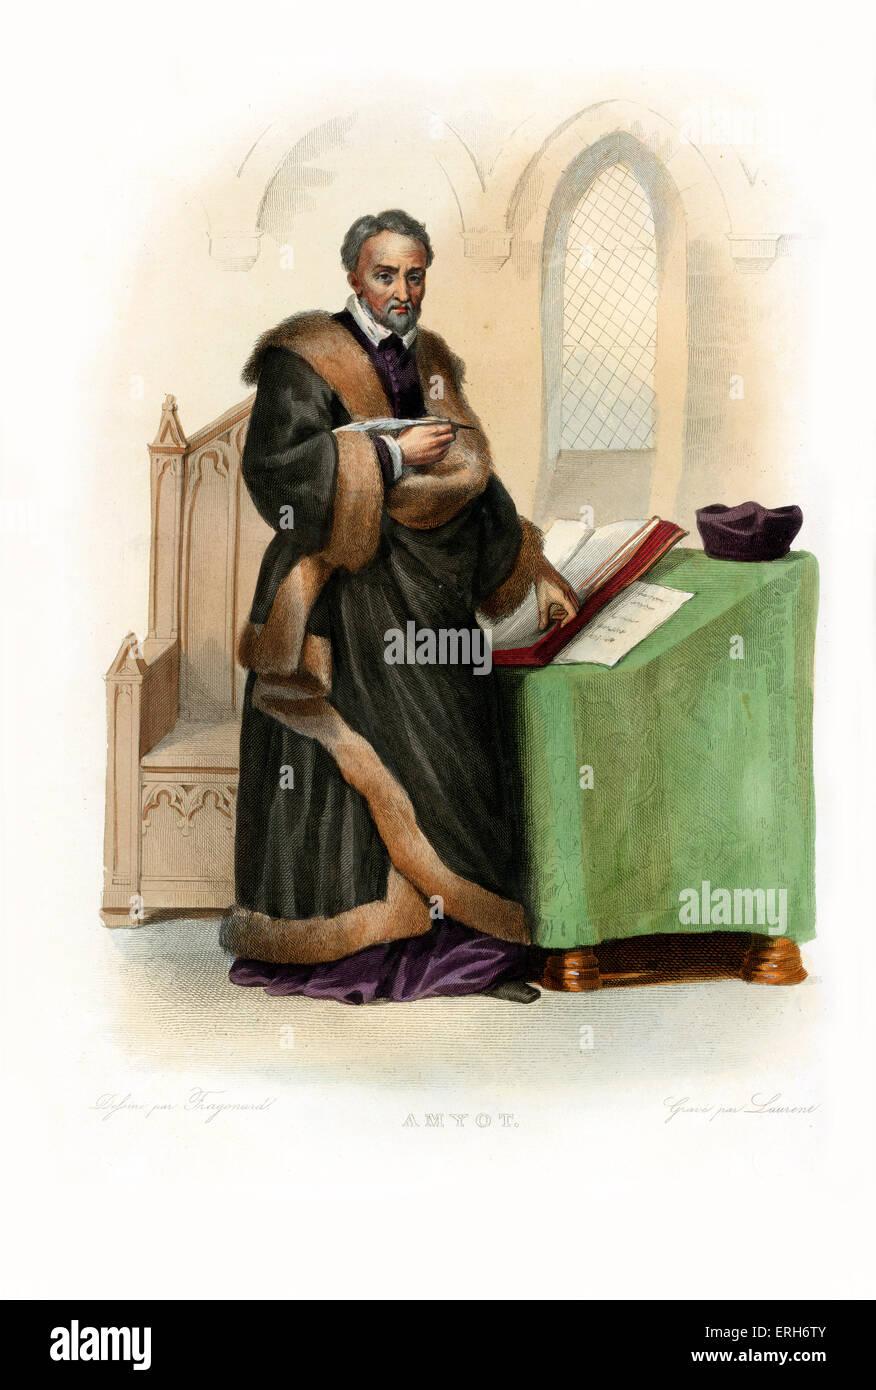 Jacques Amyot. Escritor renacentista francés y traductor. c.1514-1593. Grabado por Laurent, c.1846 Imagen De Stock